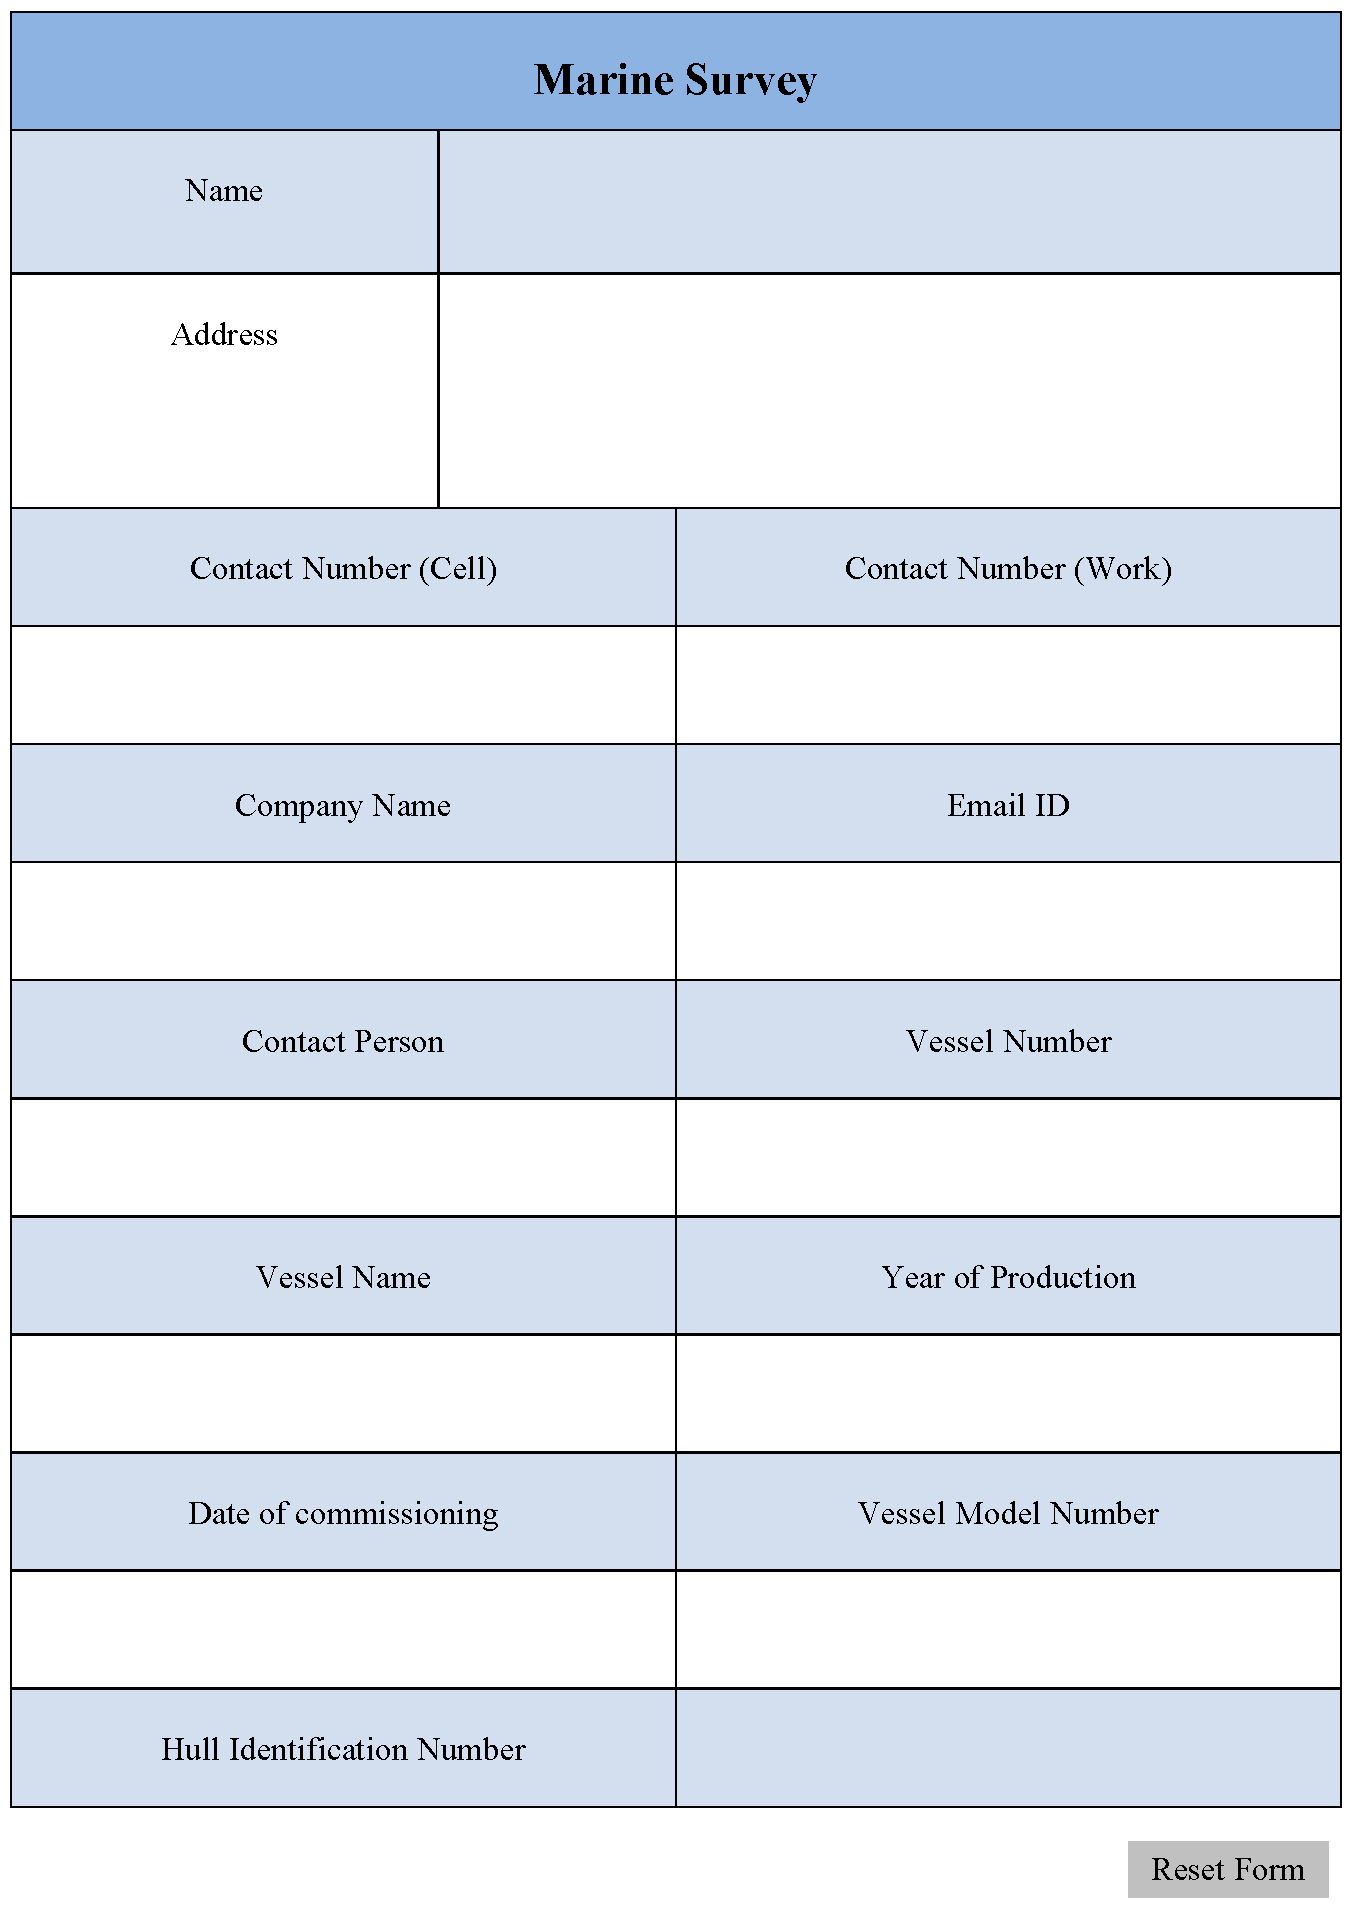 Marine Survey Form